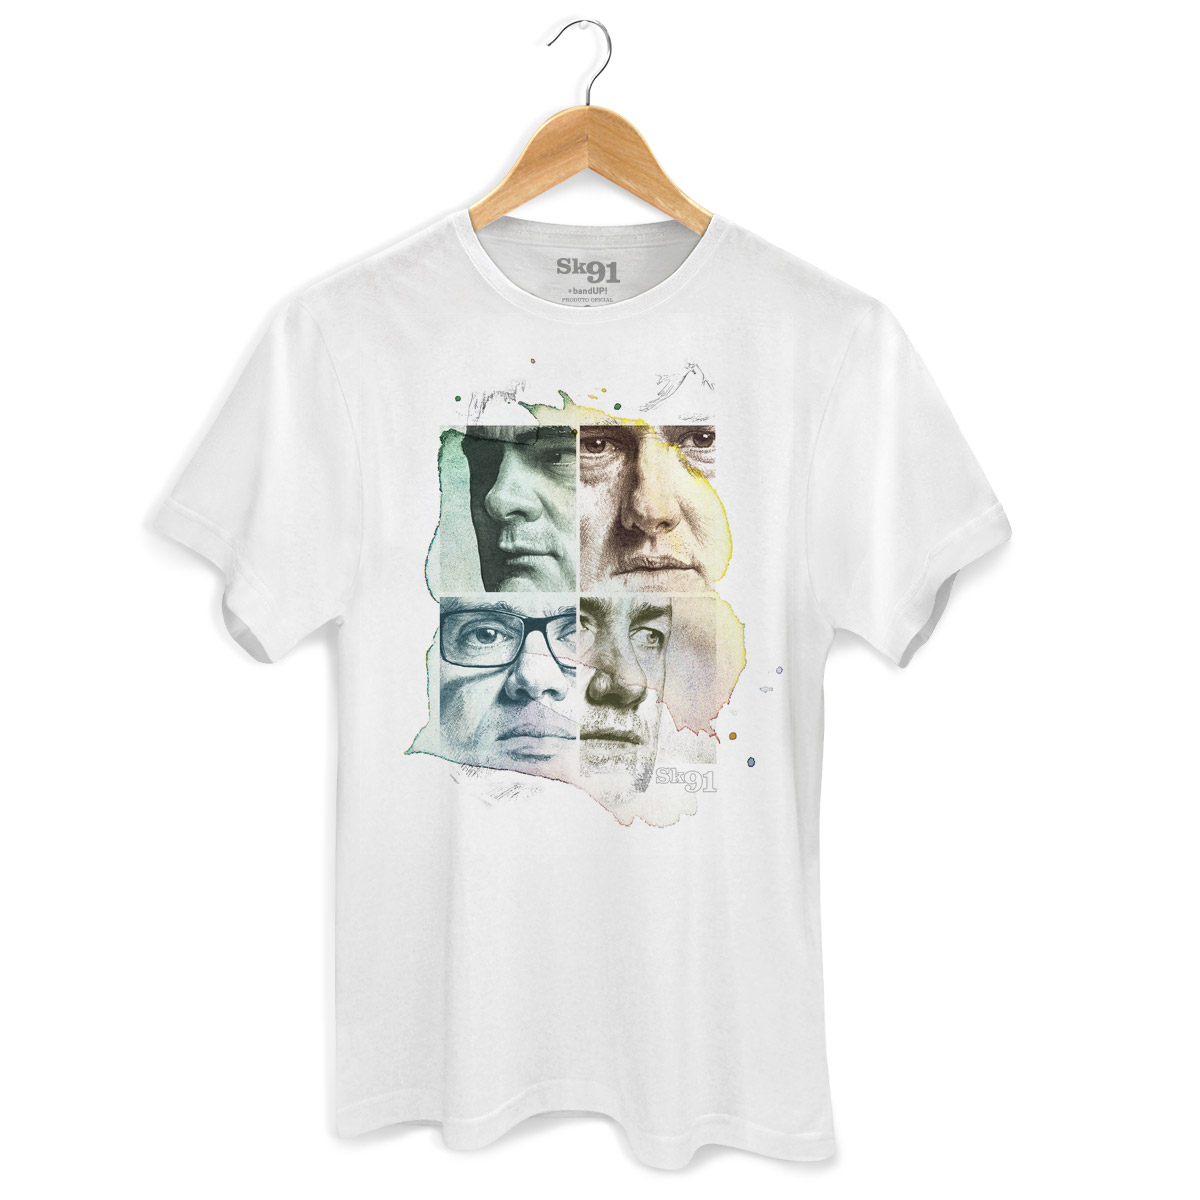 Camiseta Masculina Sk91 Capa